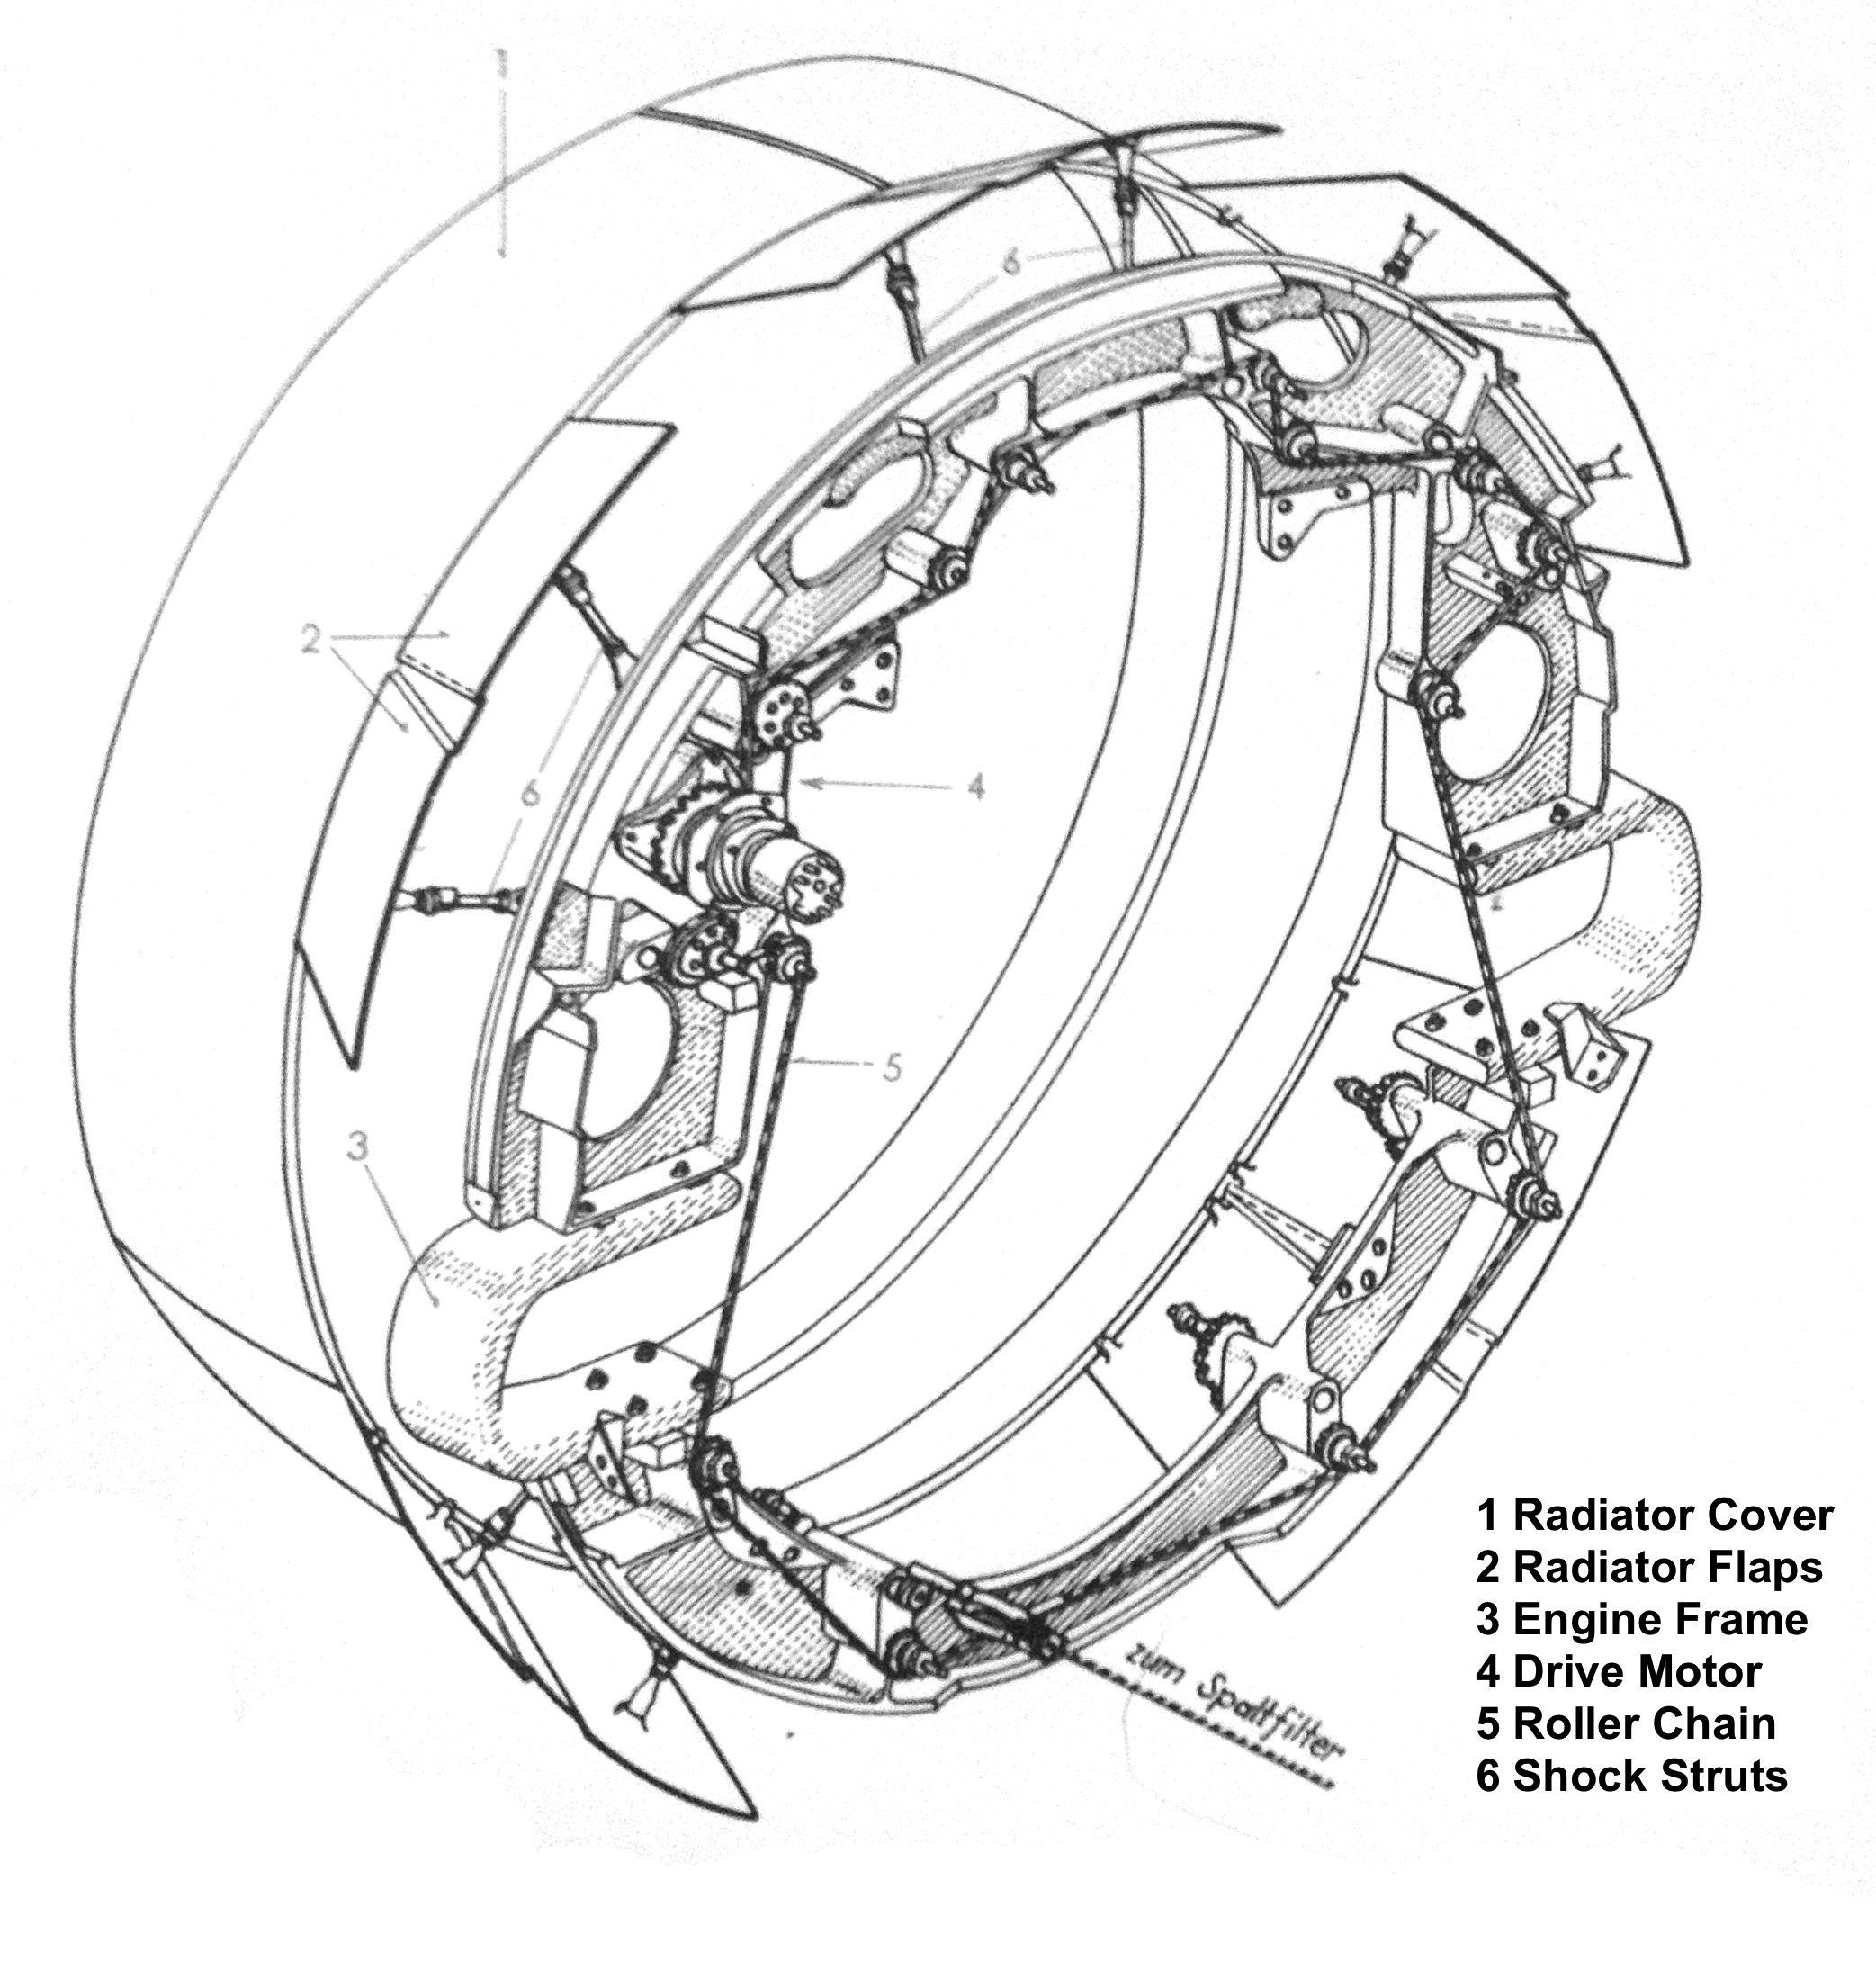 Nacelle Cowling Flaps Diagram Ju88